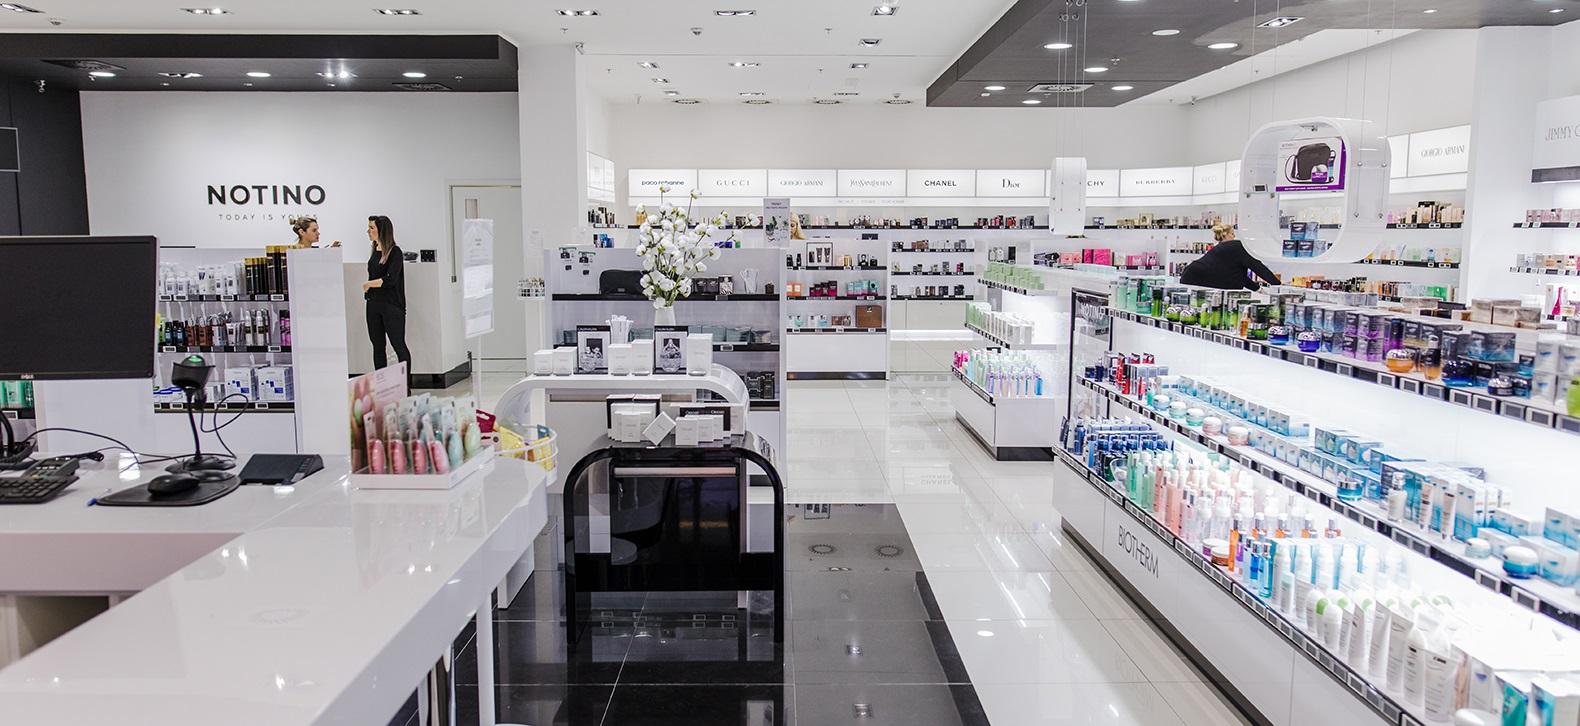 Notino recenze Parfumerie Praha – OC Europark